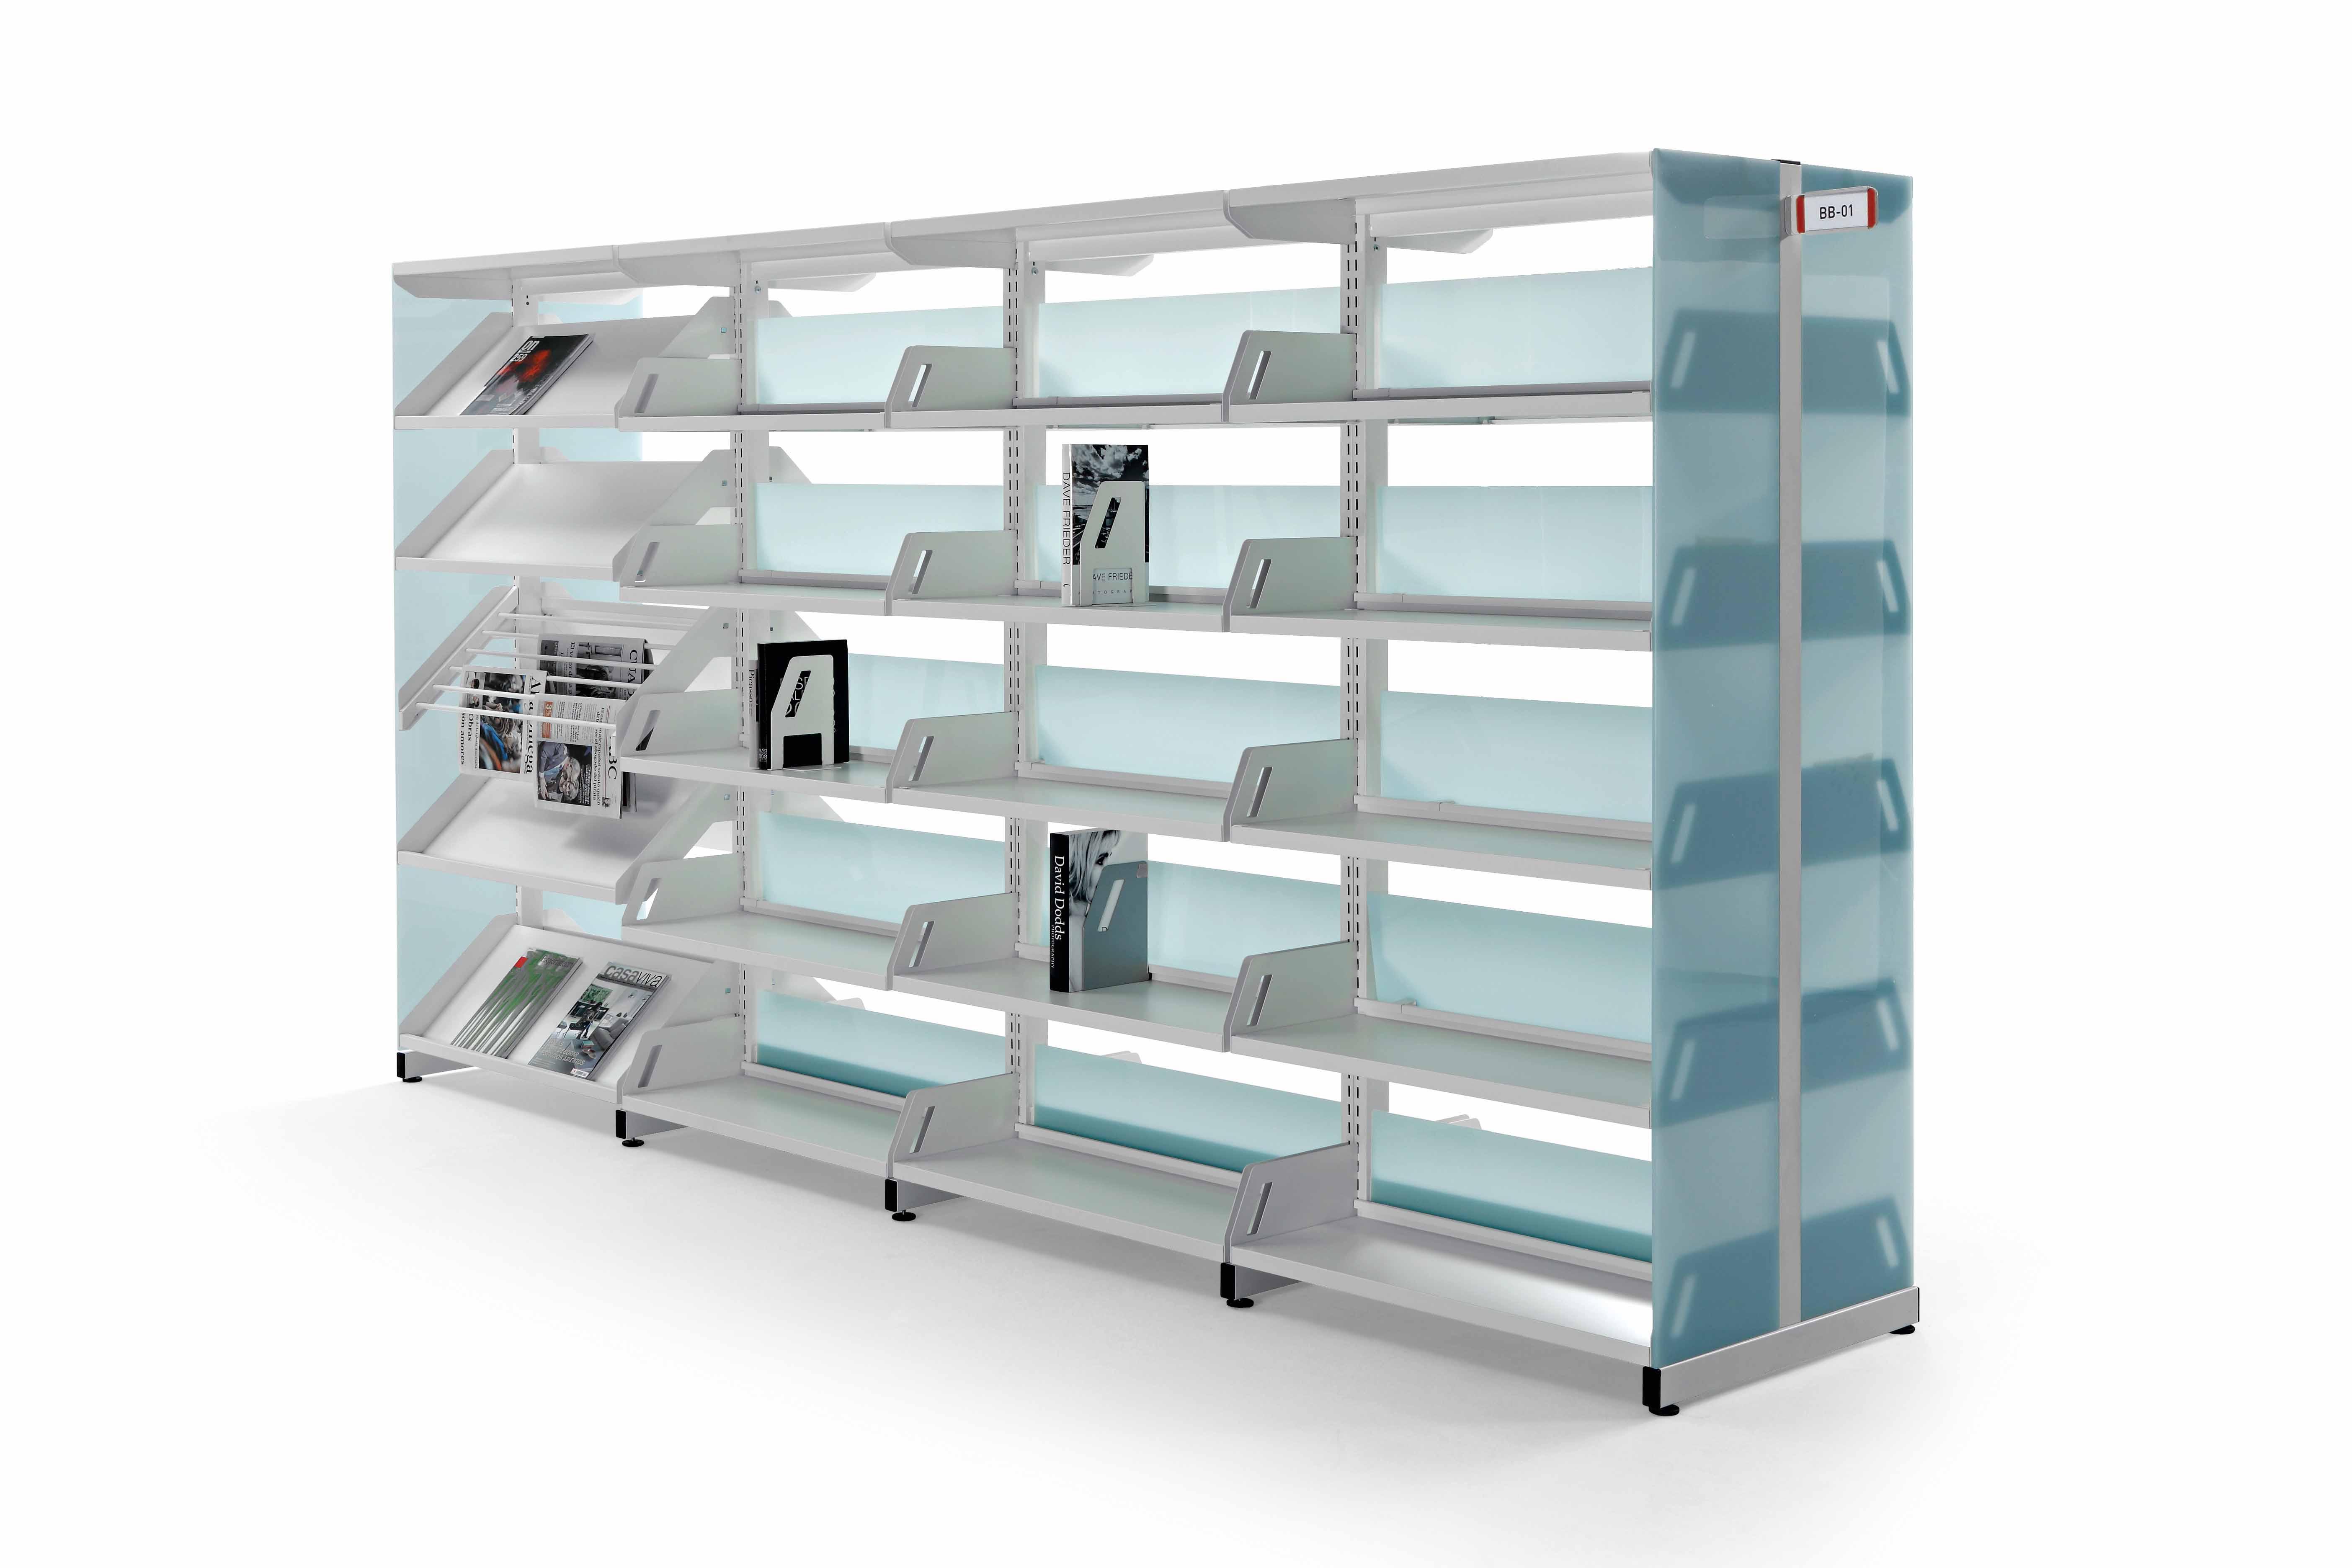 Estanterias Metalicas Oficina.Estanterias Metalicas Actiu Level Muebles De Oficina Spacio